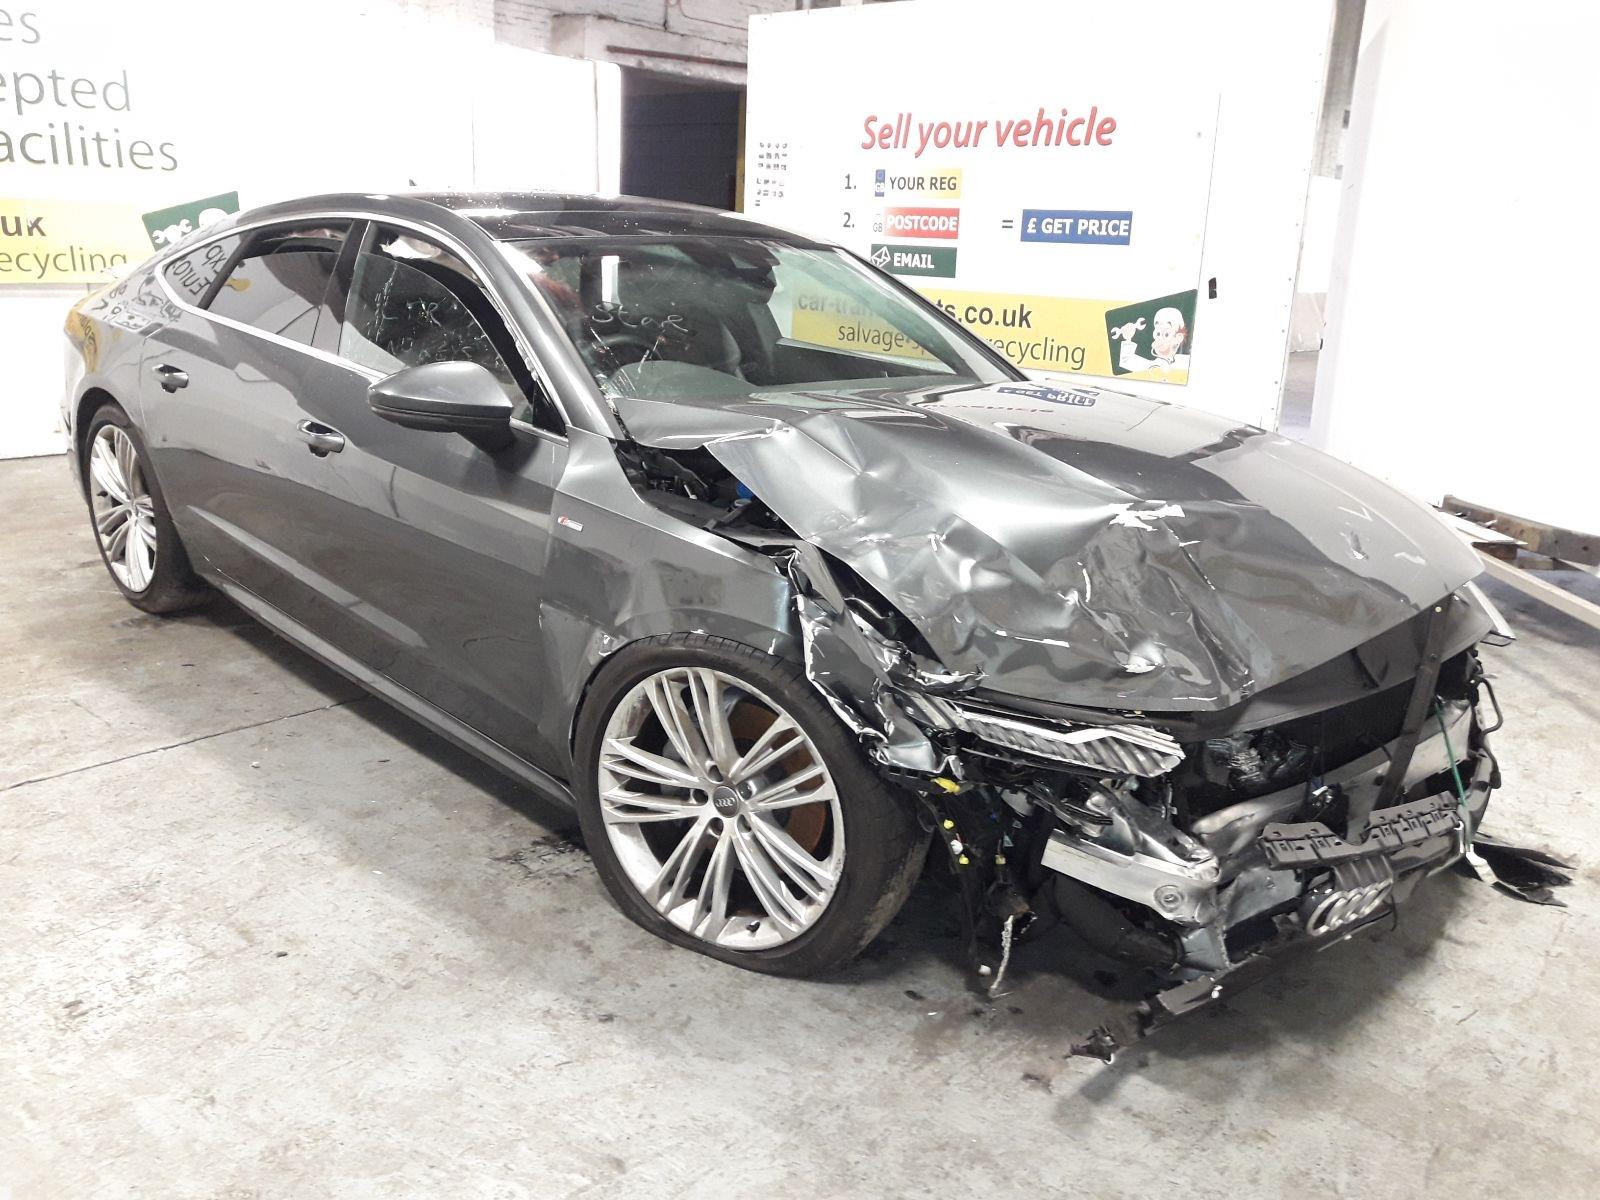 2018 Audi A7 2014 On 5 Door Hatchback Diesel Dsg Breaking For